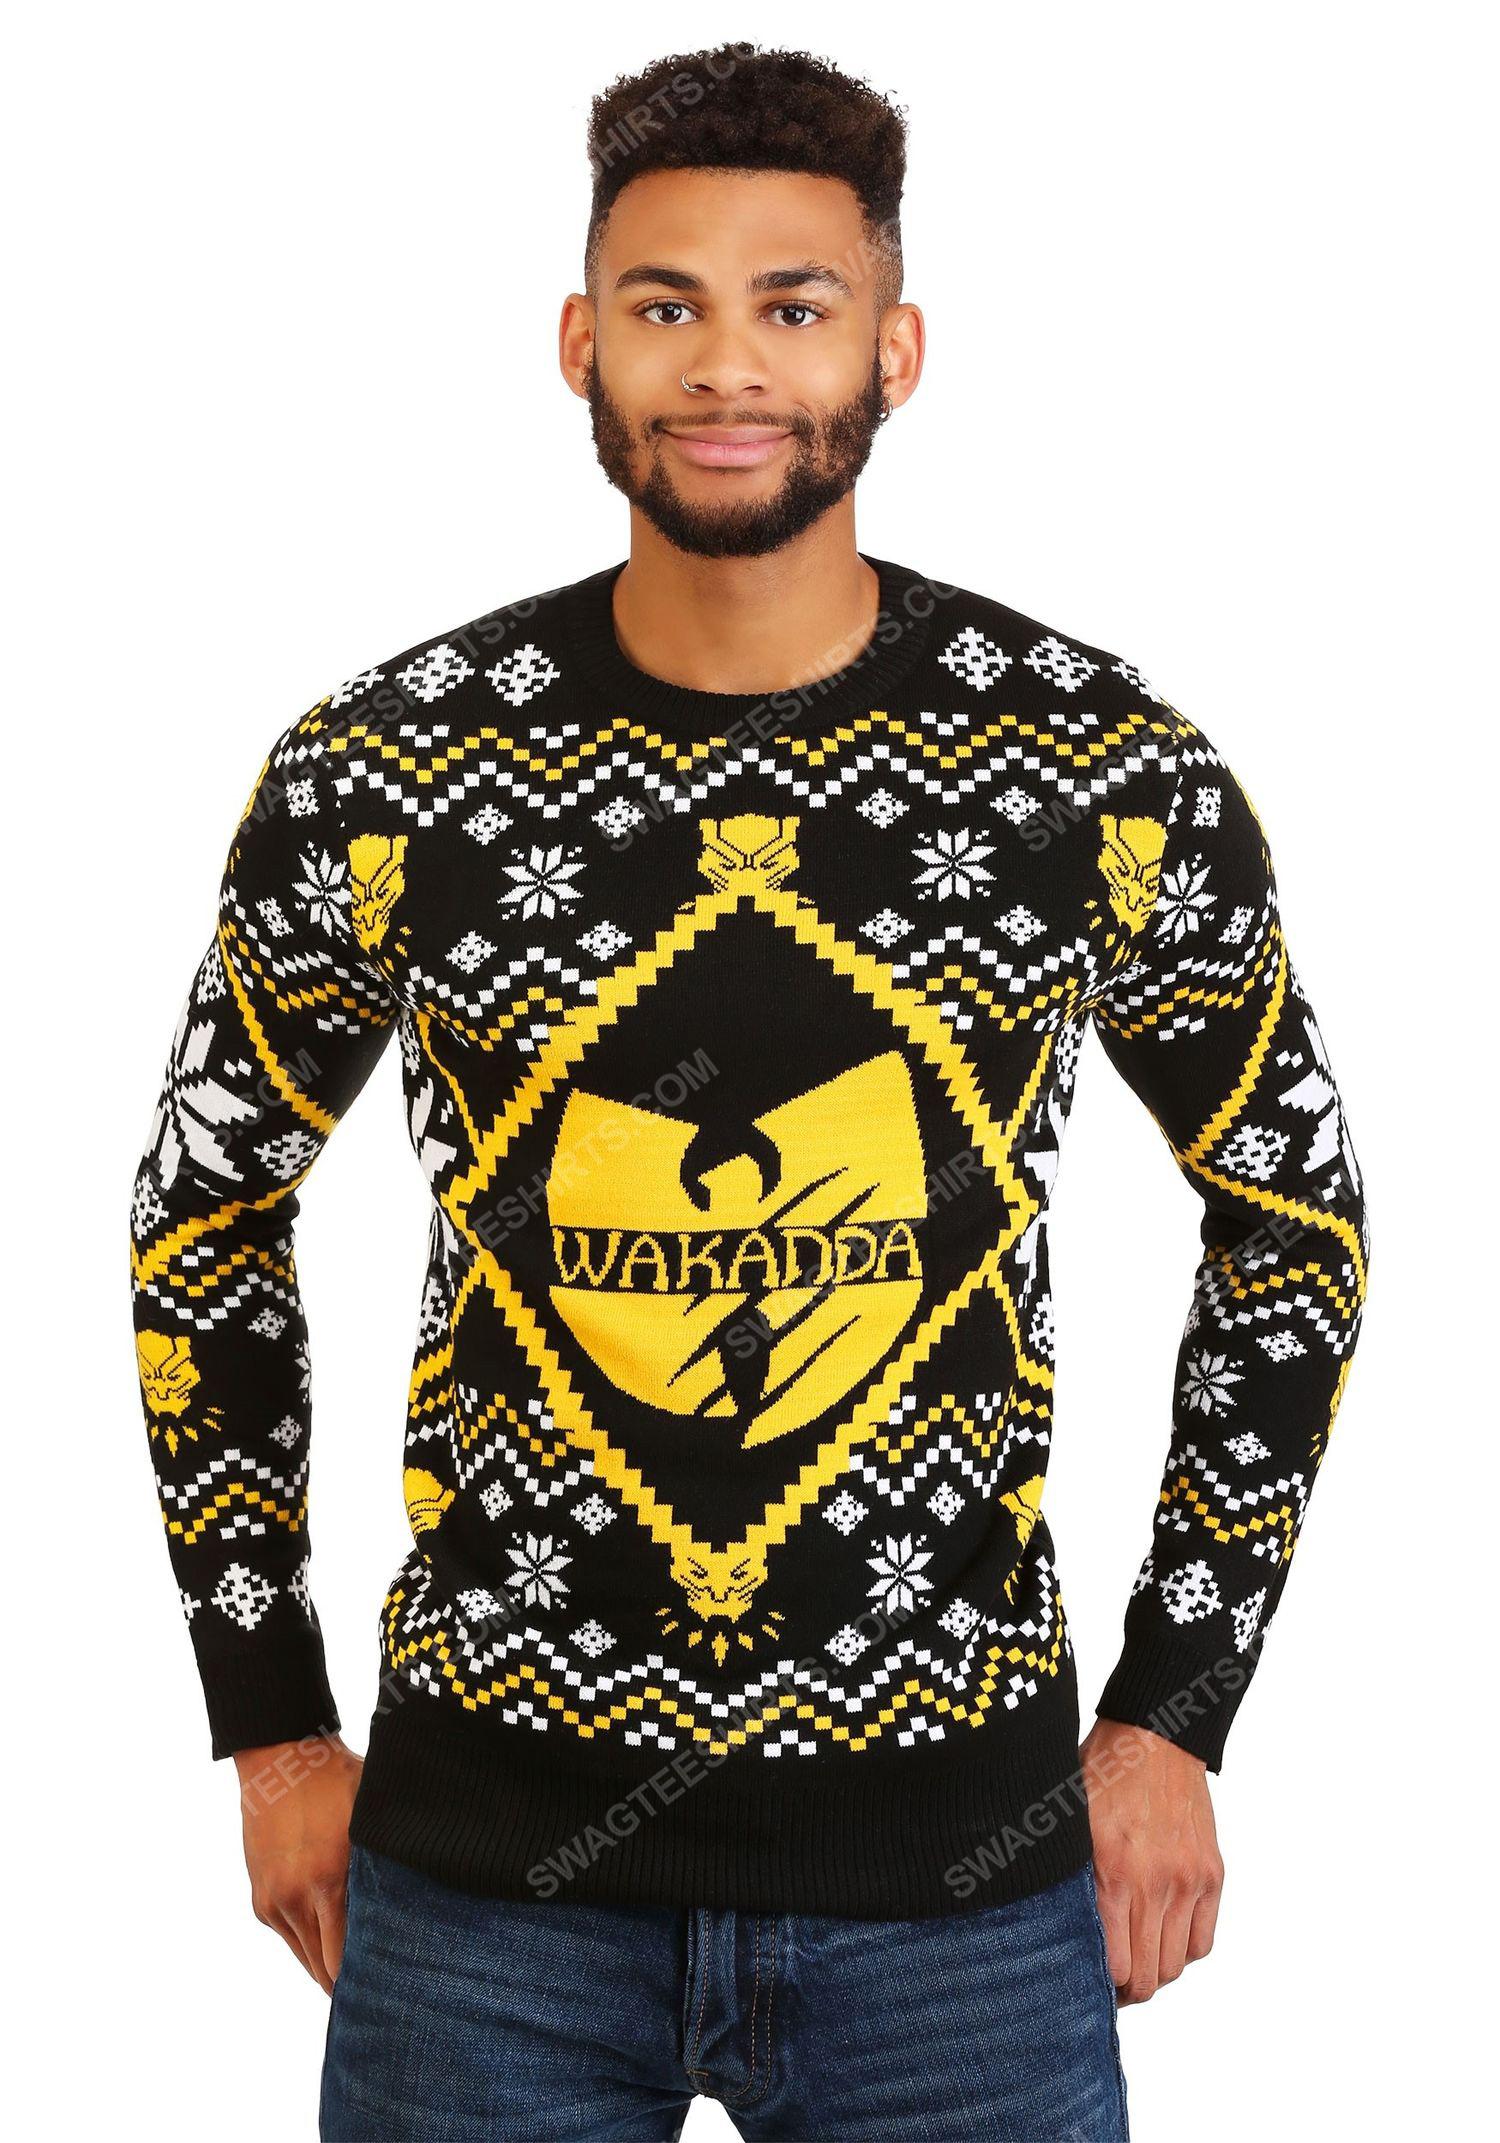 Wu tang clan black panther wakanda ugly christmas sweater 2 - Copy (3)